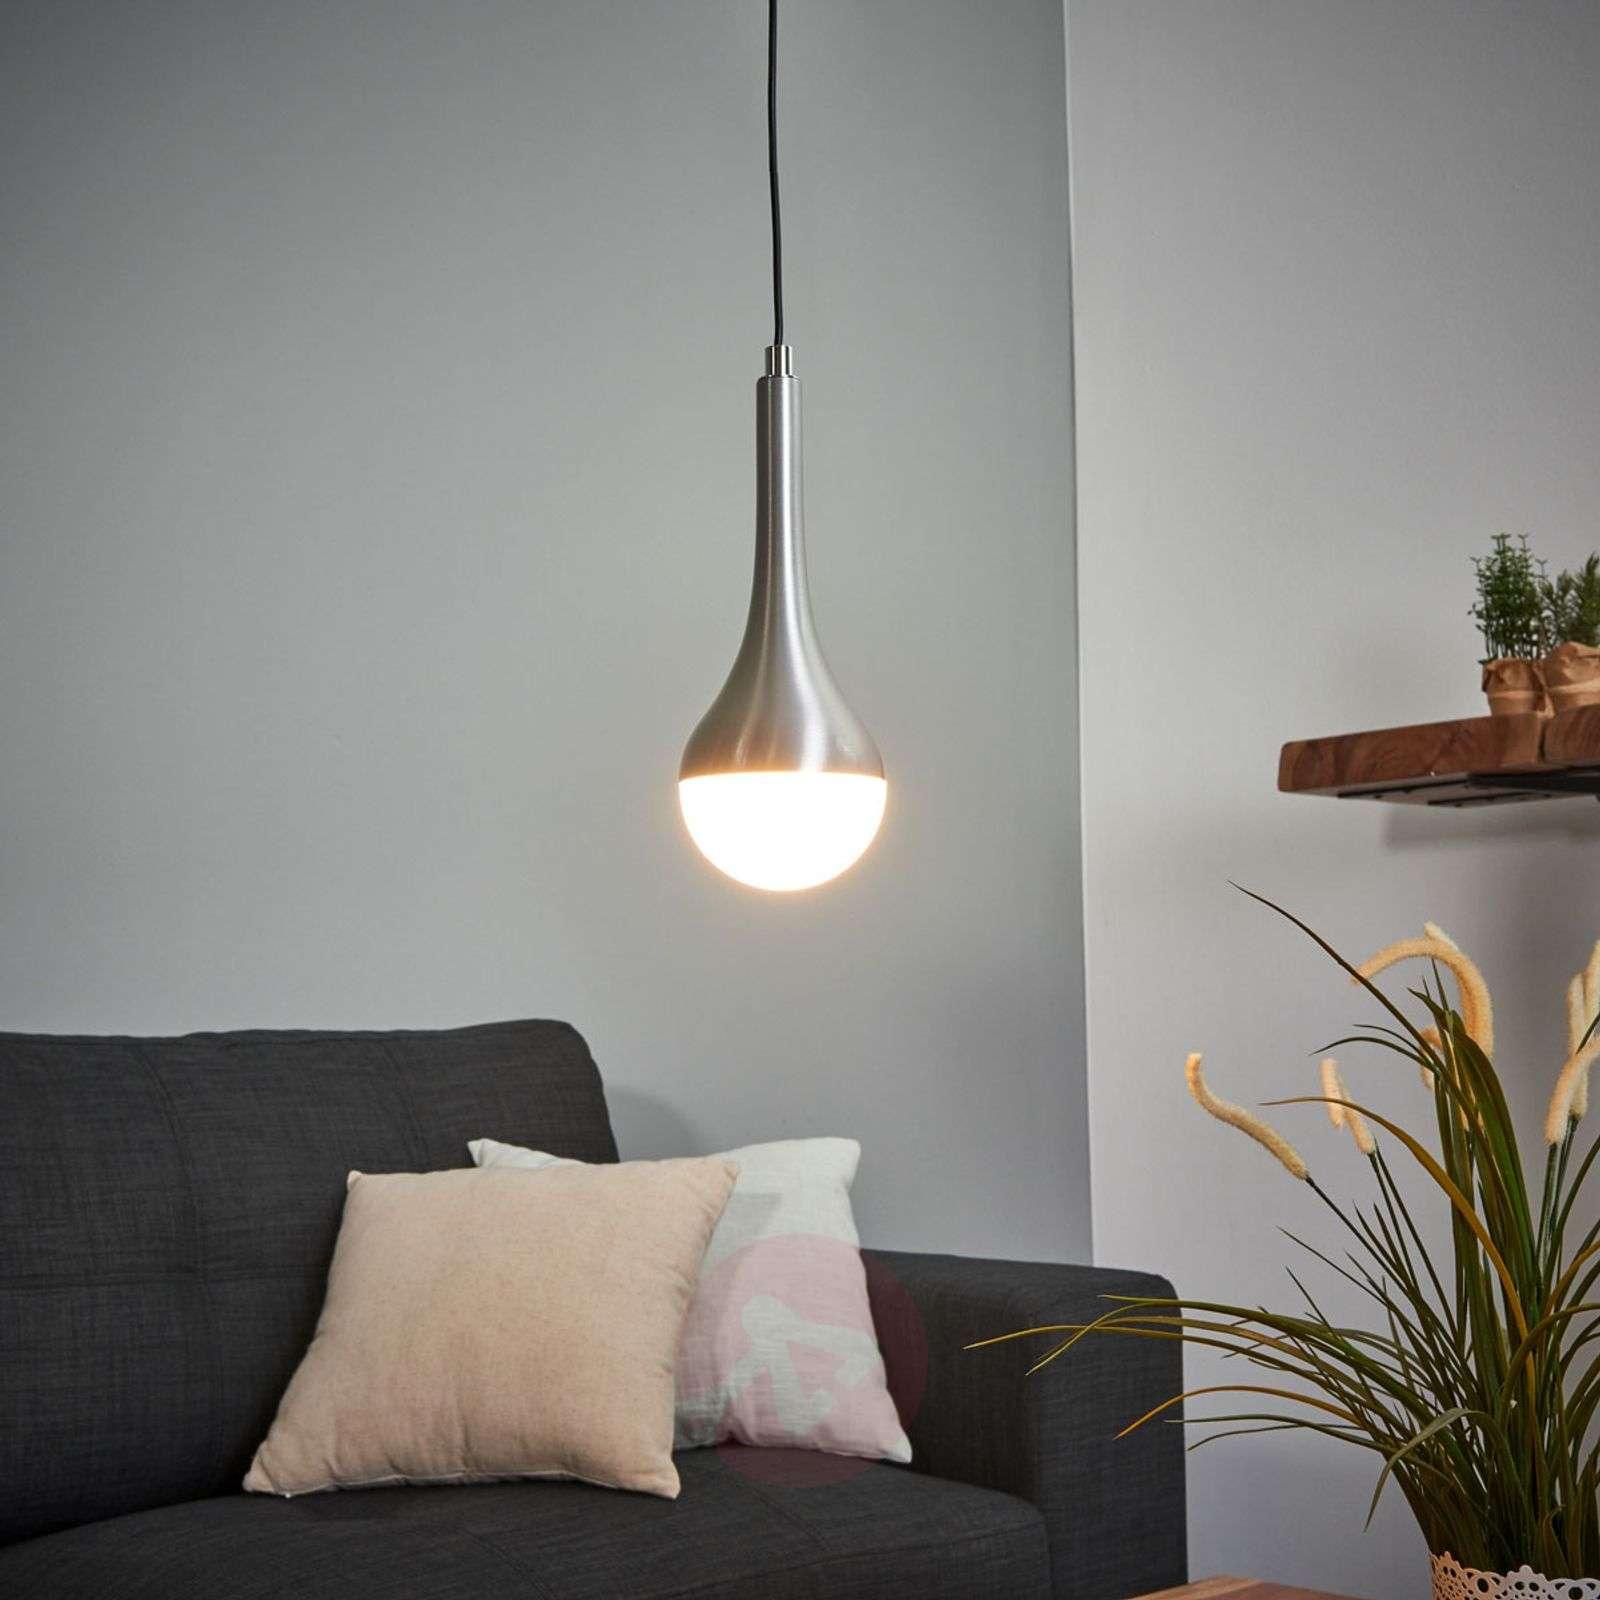 Single-bulb LED hanging light Drop, warm white-9004701-01